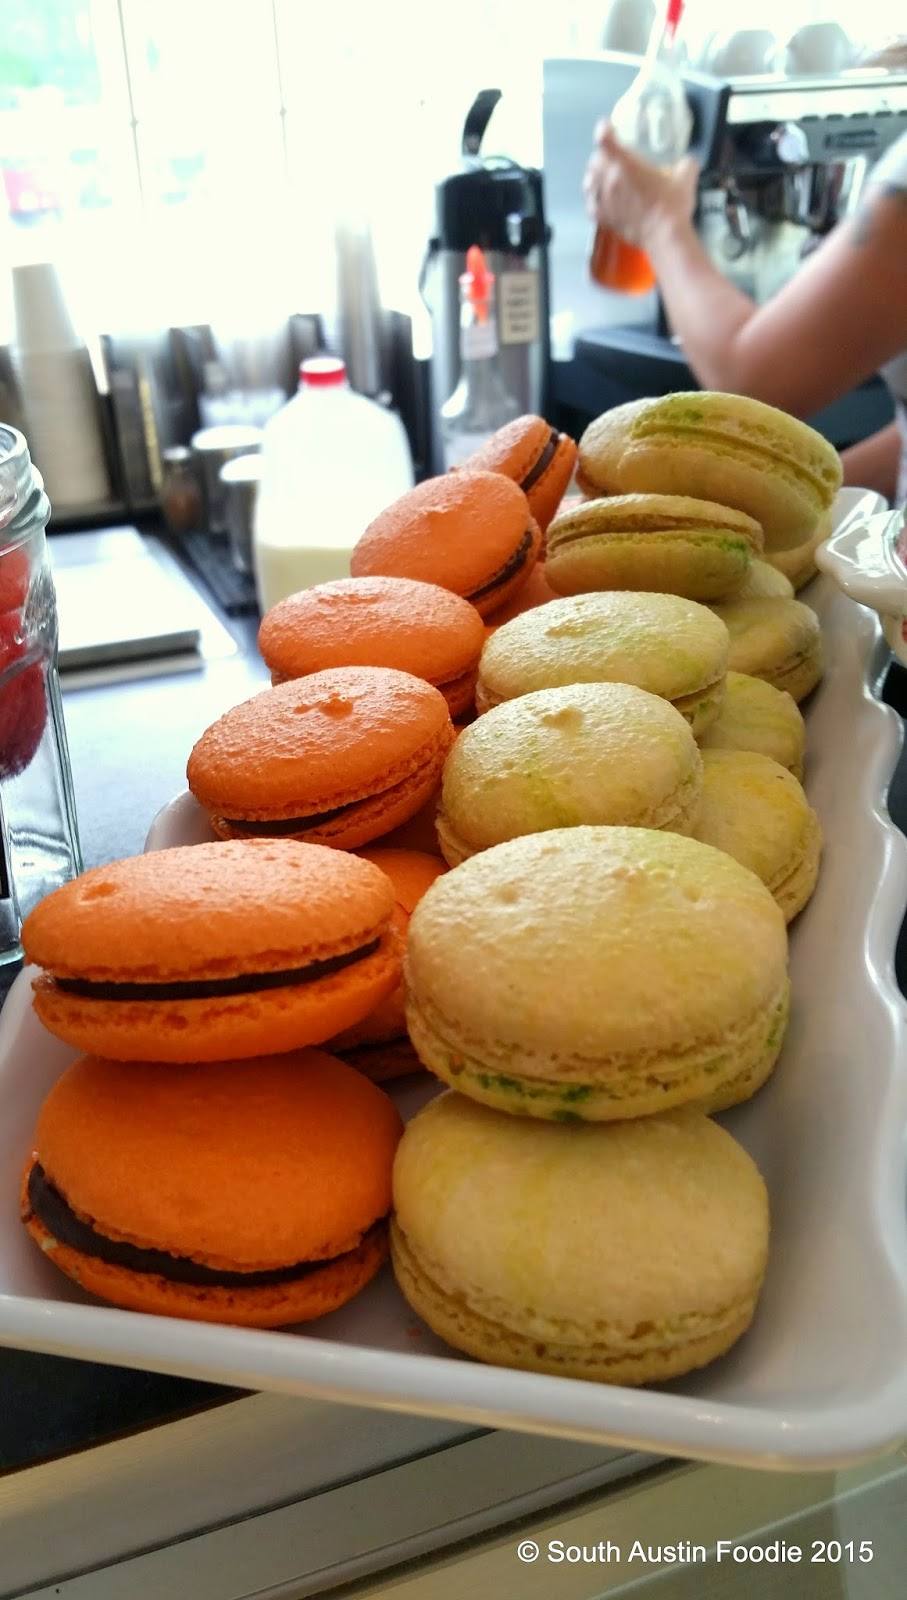 South Austin Foodie: La Patisserie -- Sweet AND Savory!